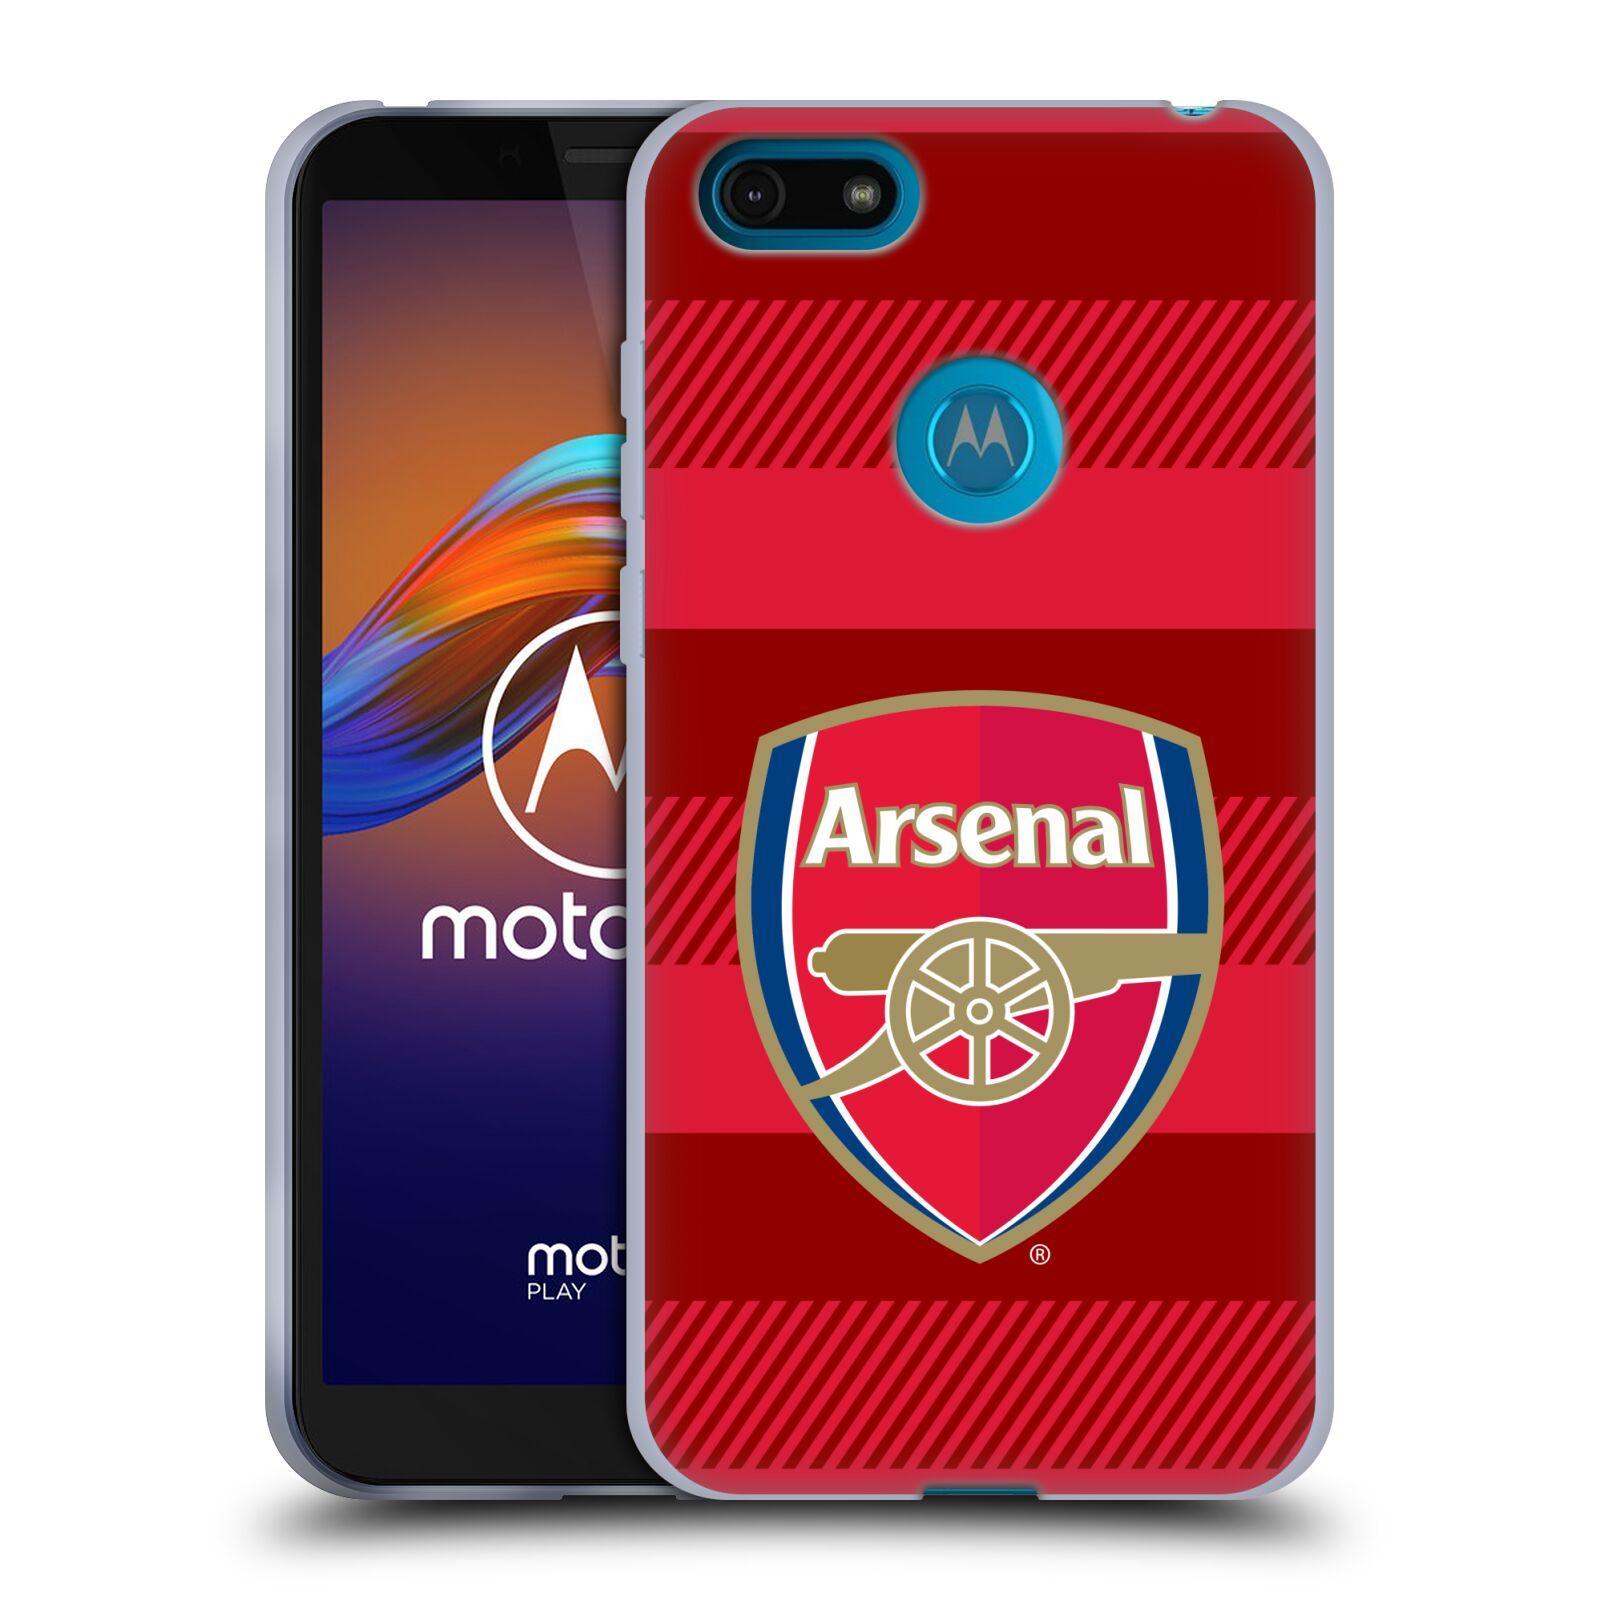 Silikonové pouzdro na mobil Motorola Moto E6 Play - Head Case - Arsenal FC - Logo s pruhy